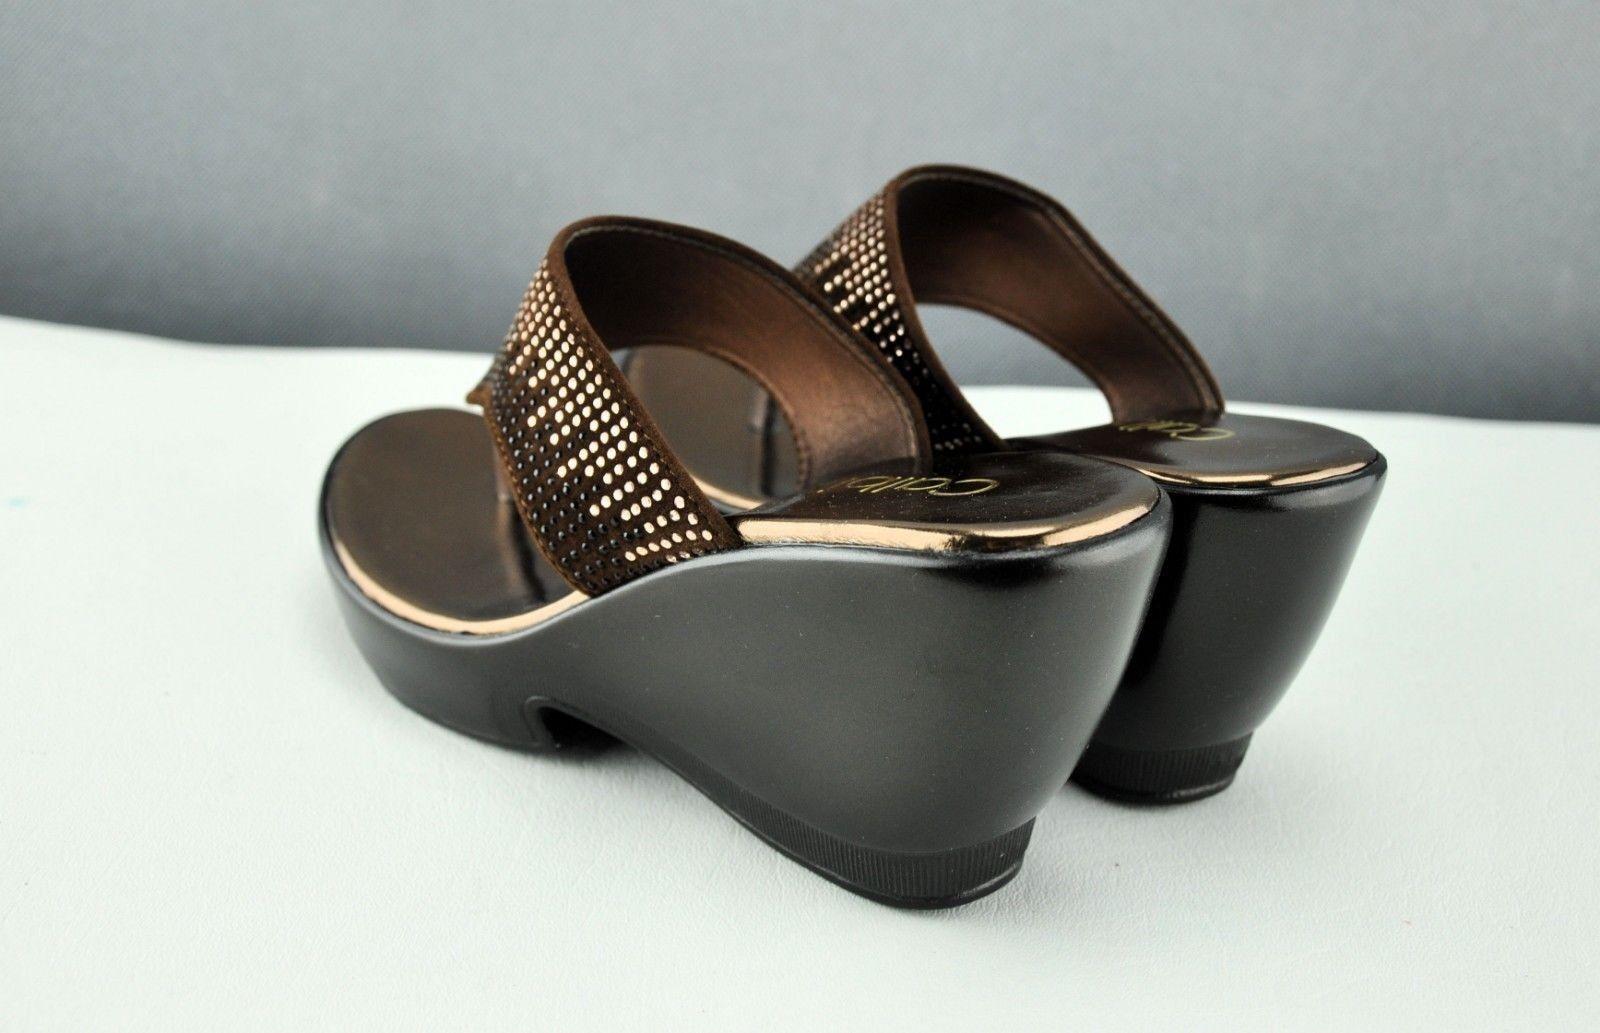 Brand New New New Bronze Calbi donna Sandal scarpe Heels Casual Comfort Flip Flop Dimensione 7 4d73c6